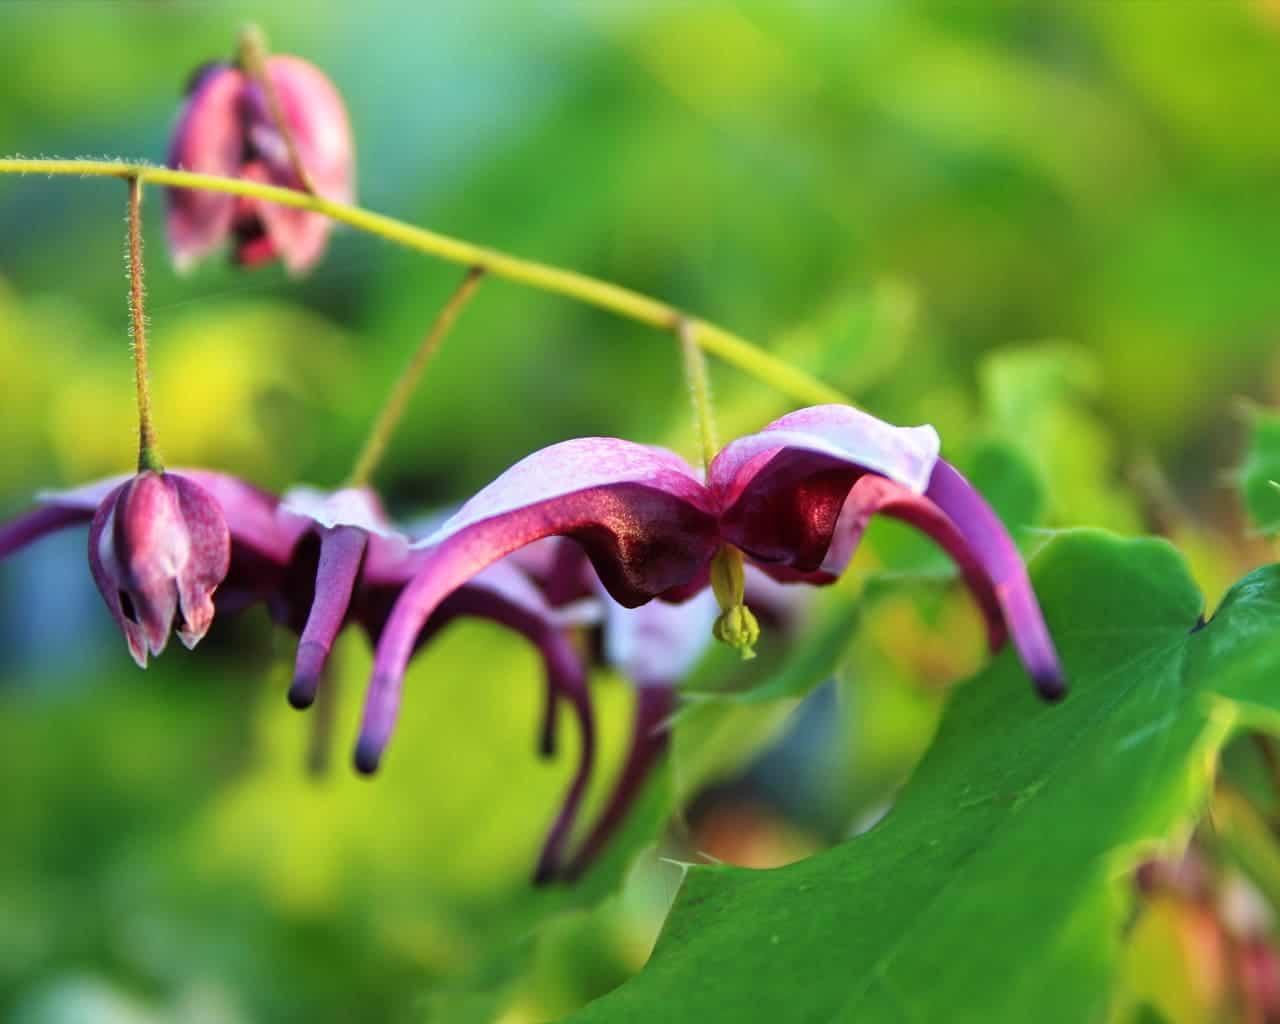 Epimedium acuminatum 'Night Mistress', Elfenblume, Laubschmuck, violette Blüte